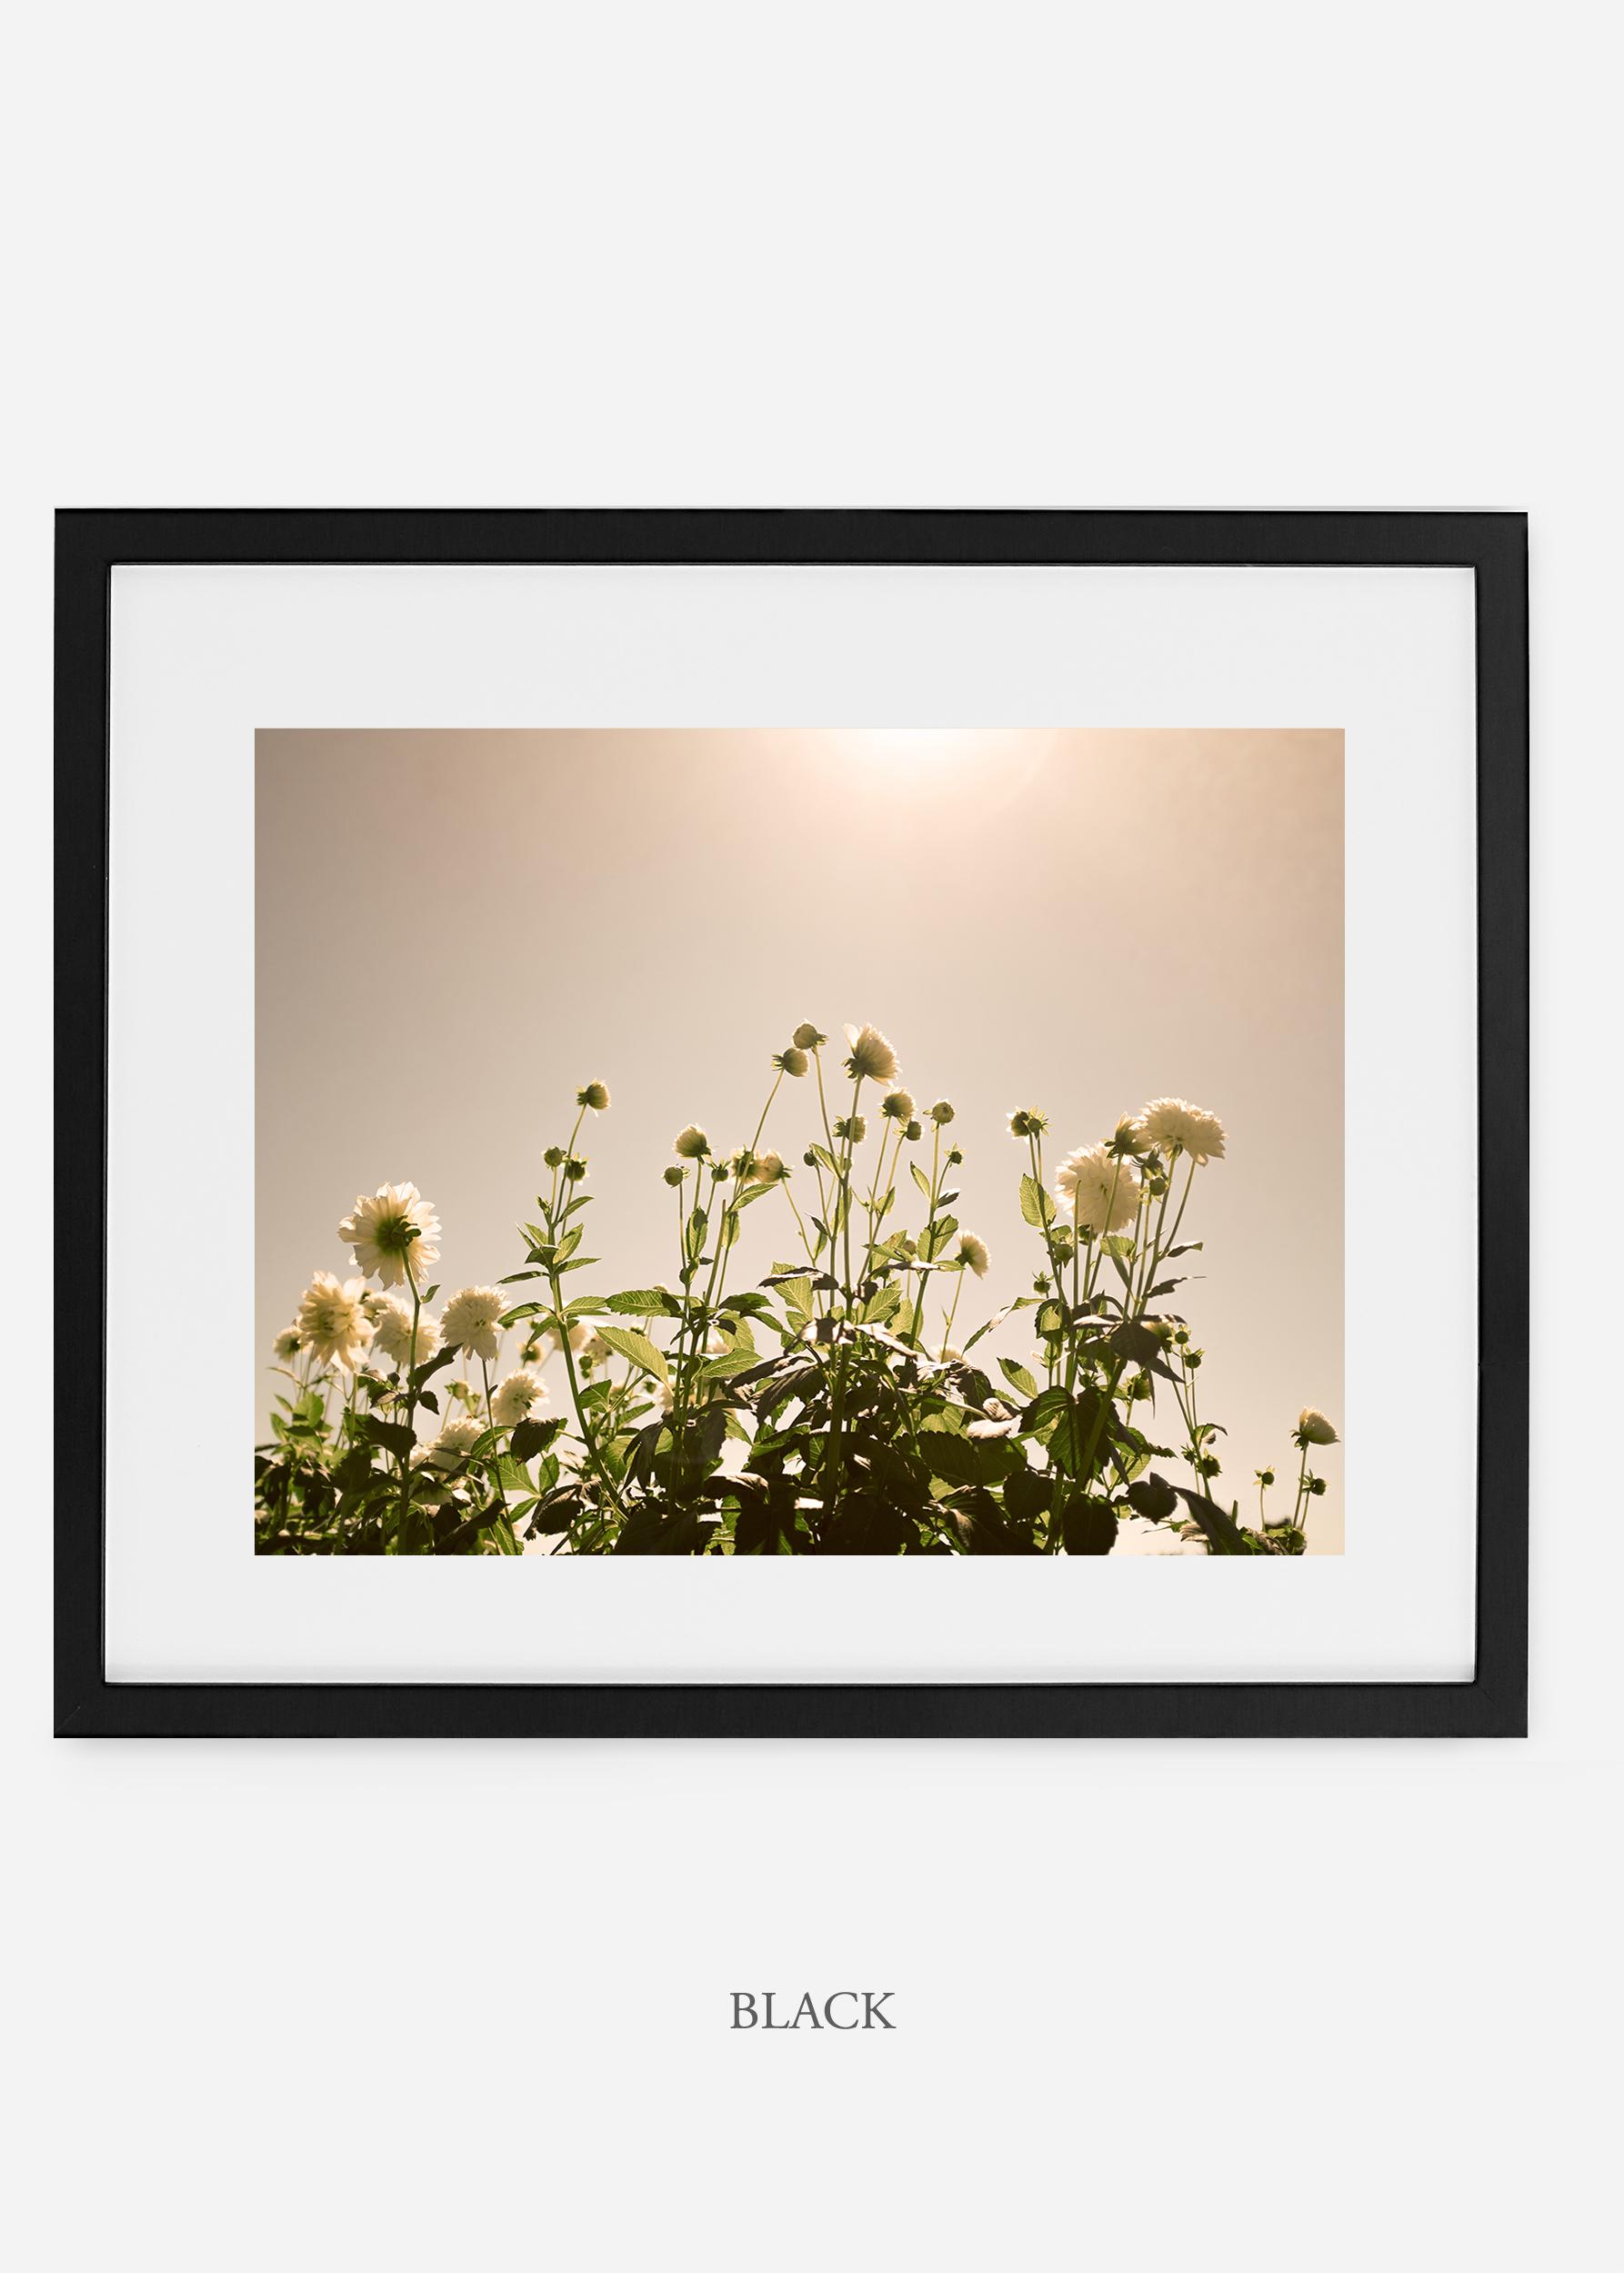 wilder-california-blackframe-dahlia-7-minimal-botanical-print-art-interior-design.jpg